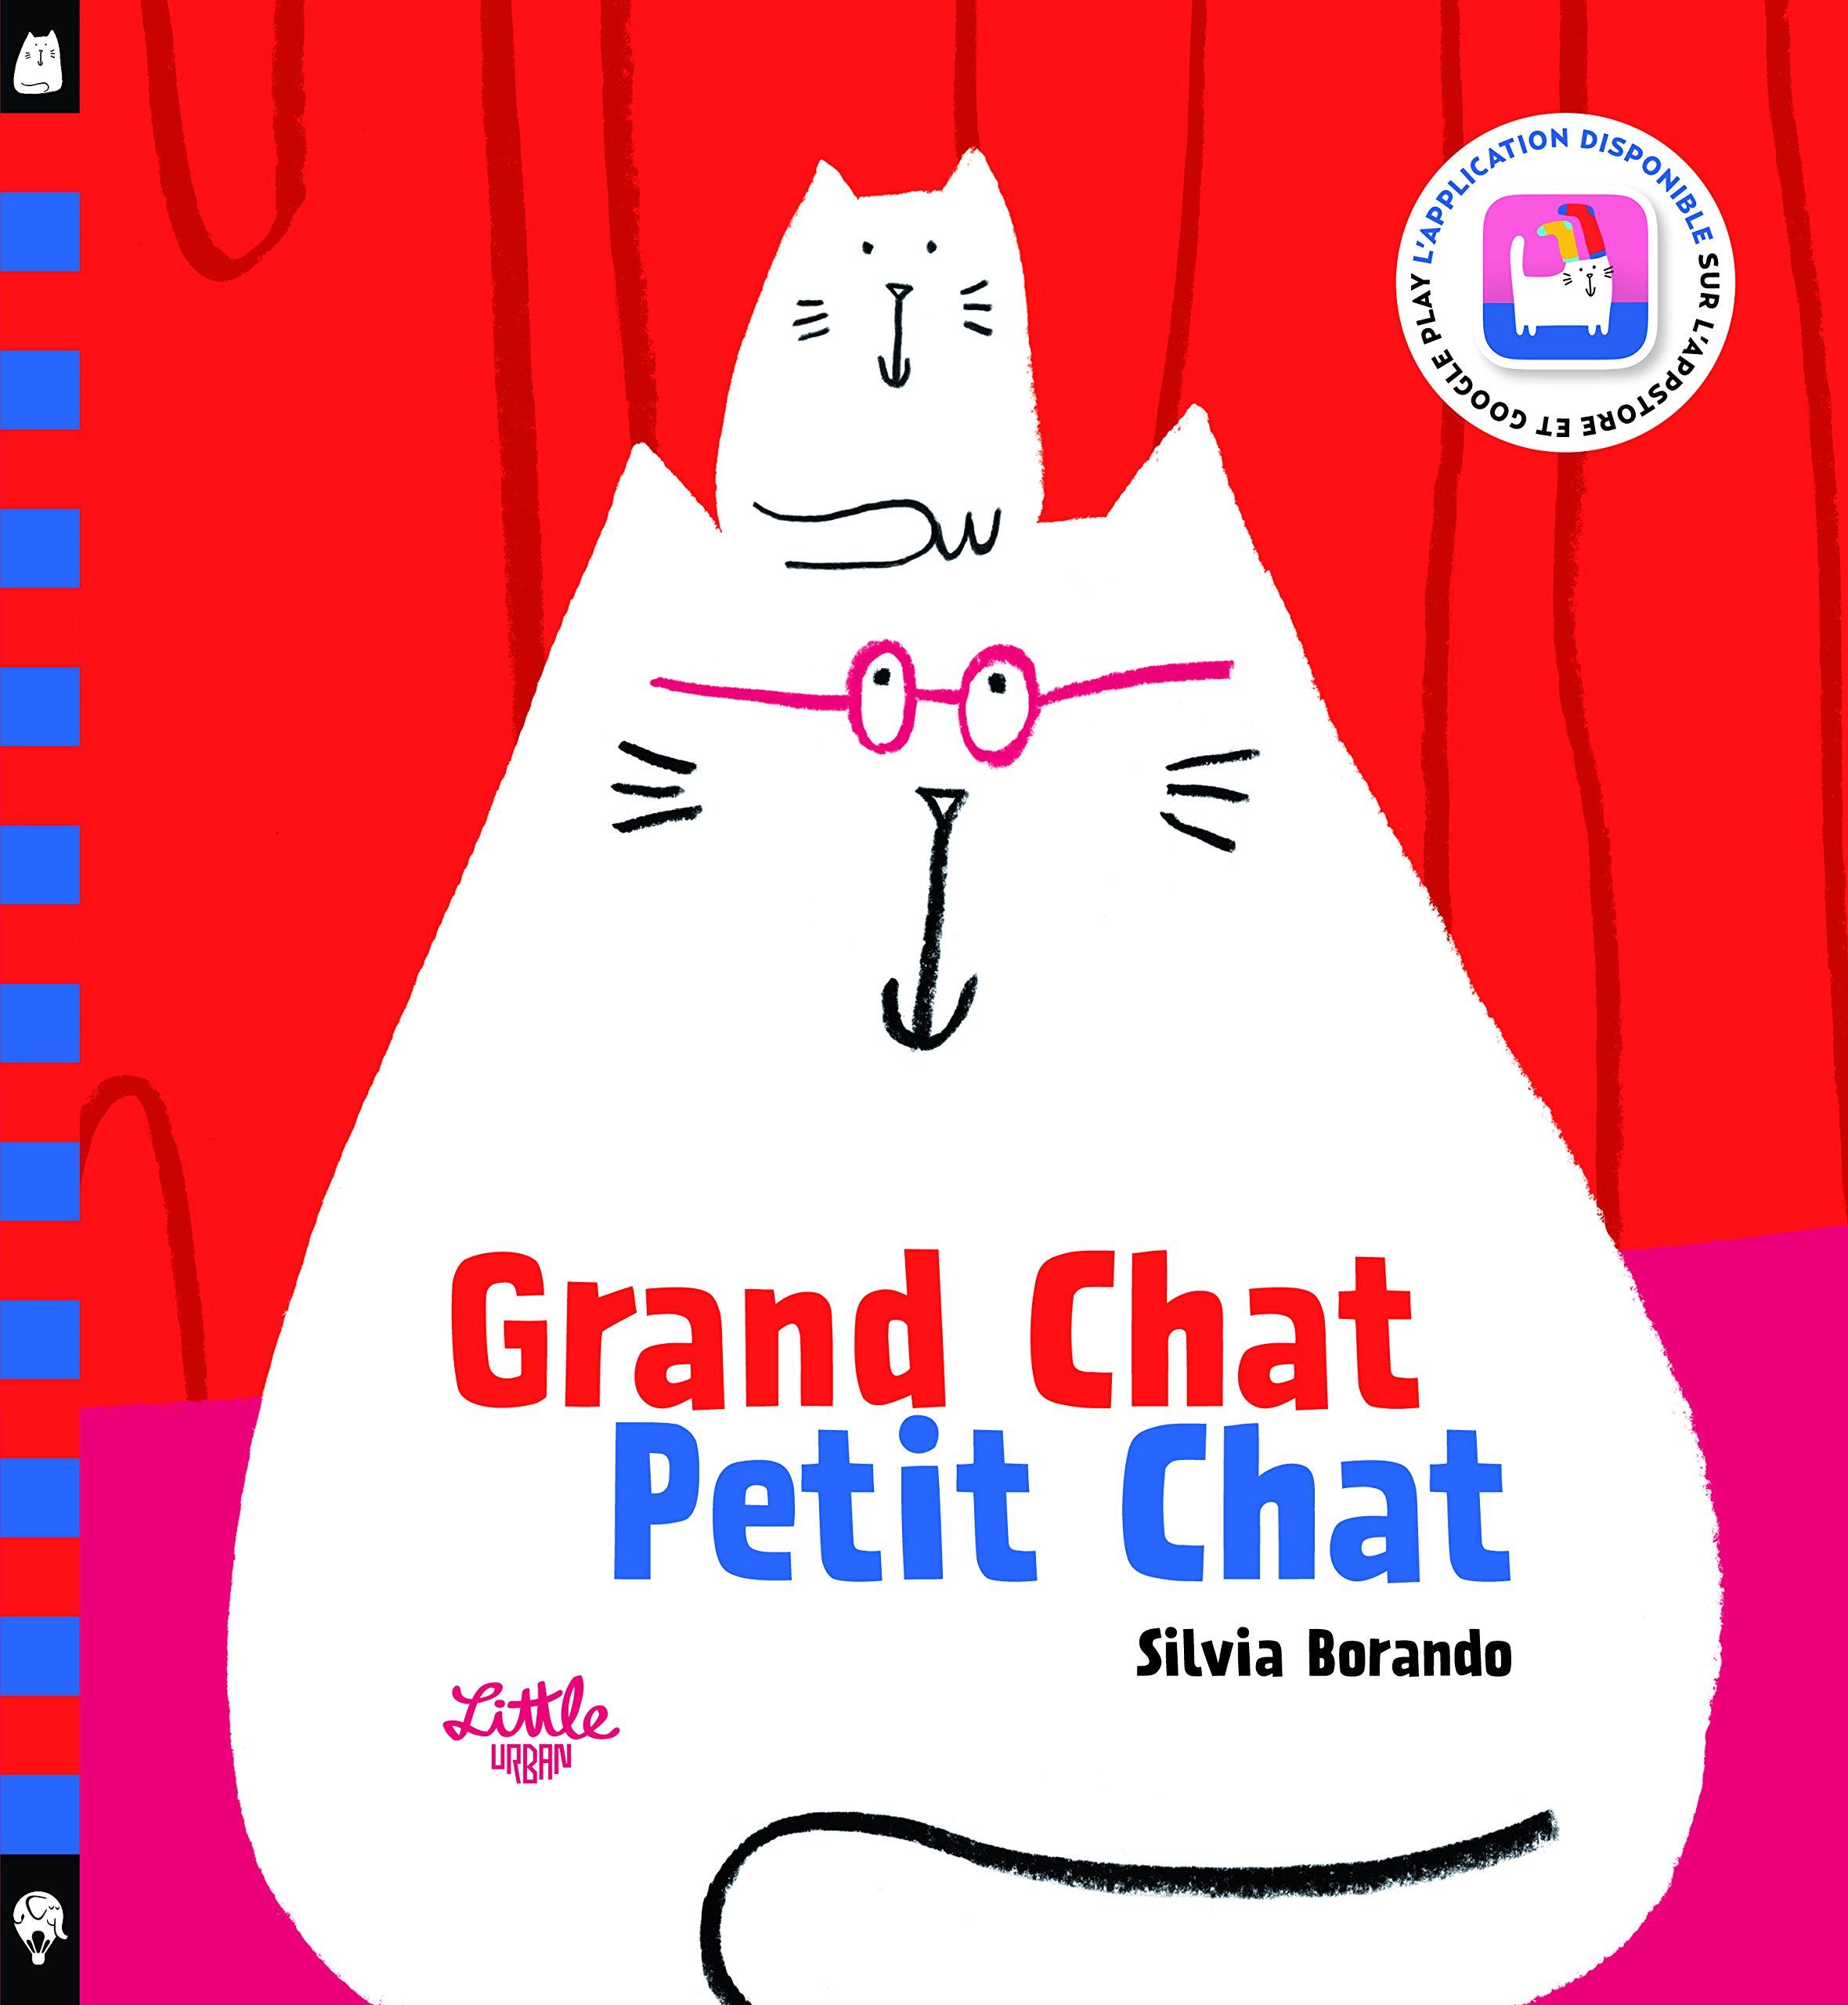 Gand chat